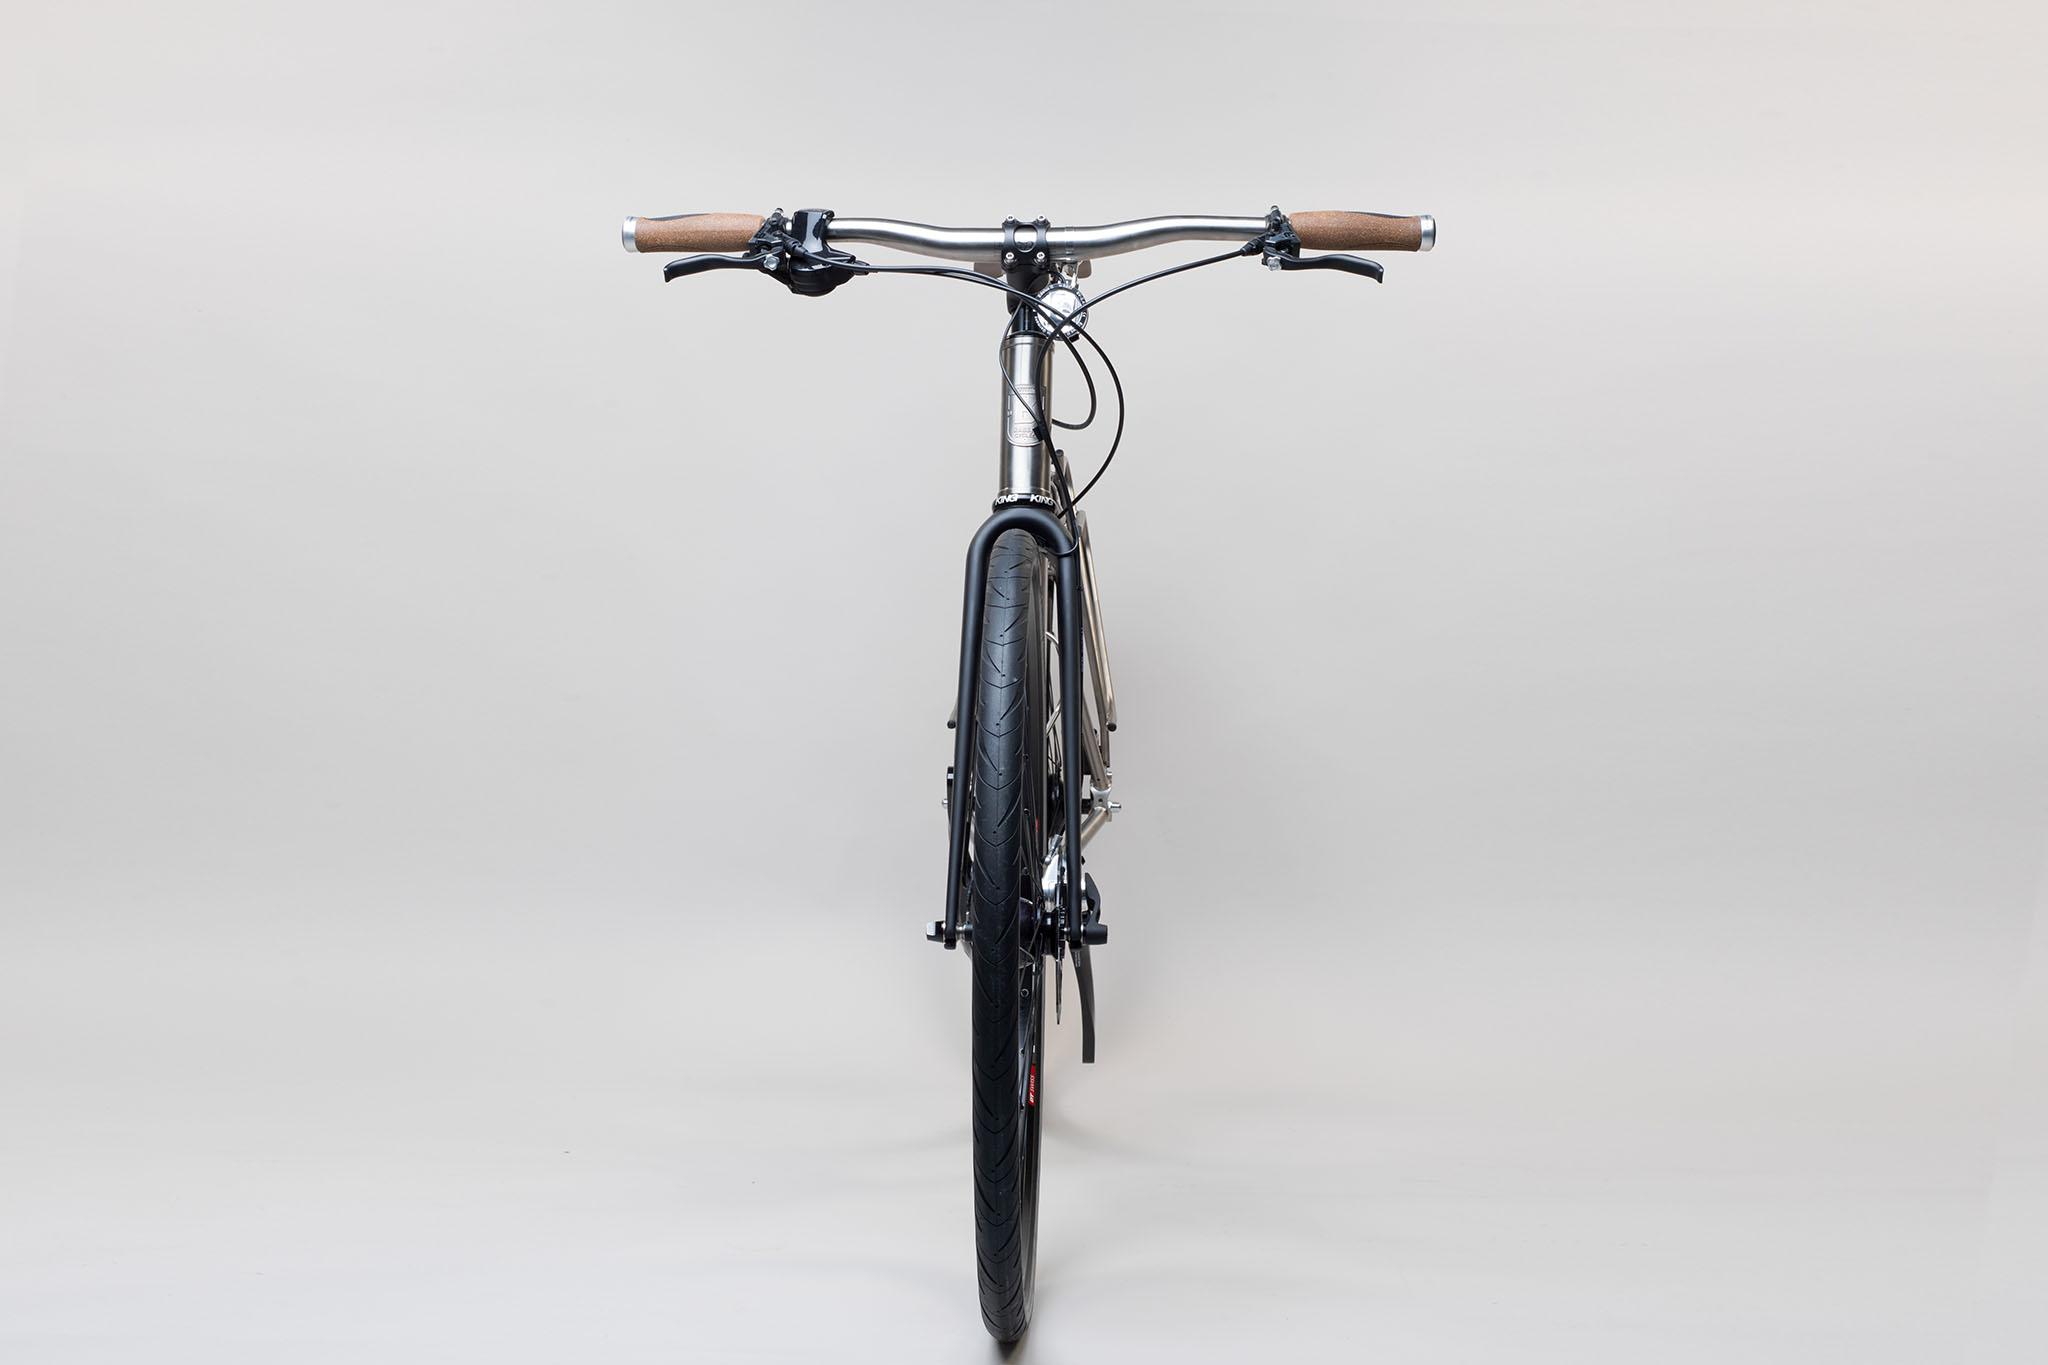 titan_commuter_36_from_rabbit_titan_cycles_bavaria